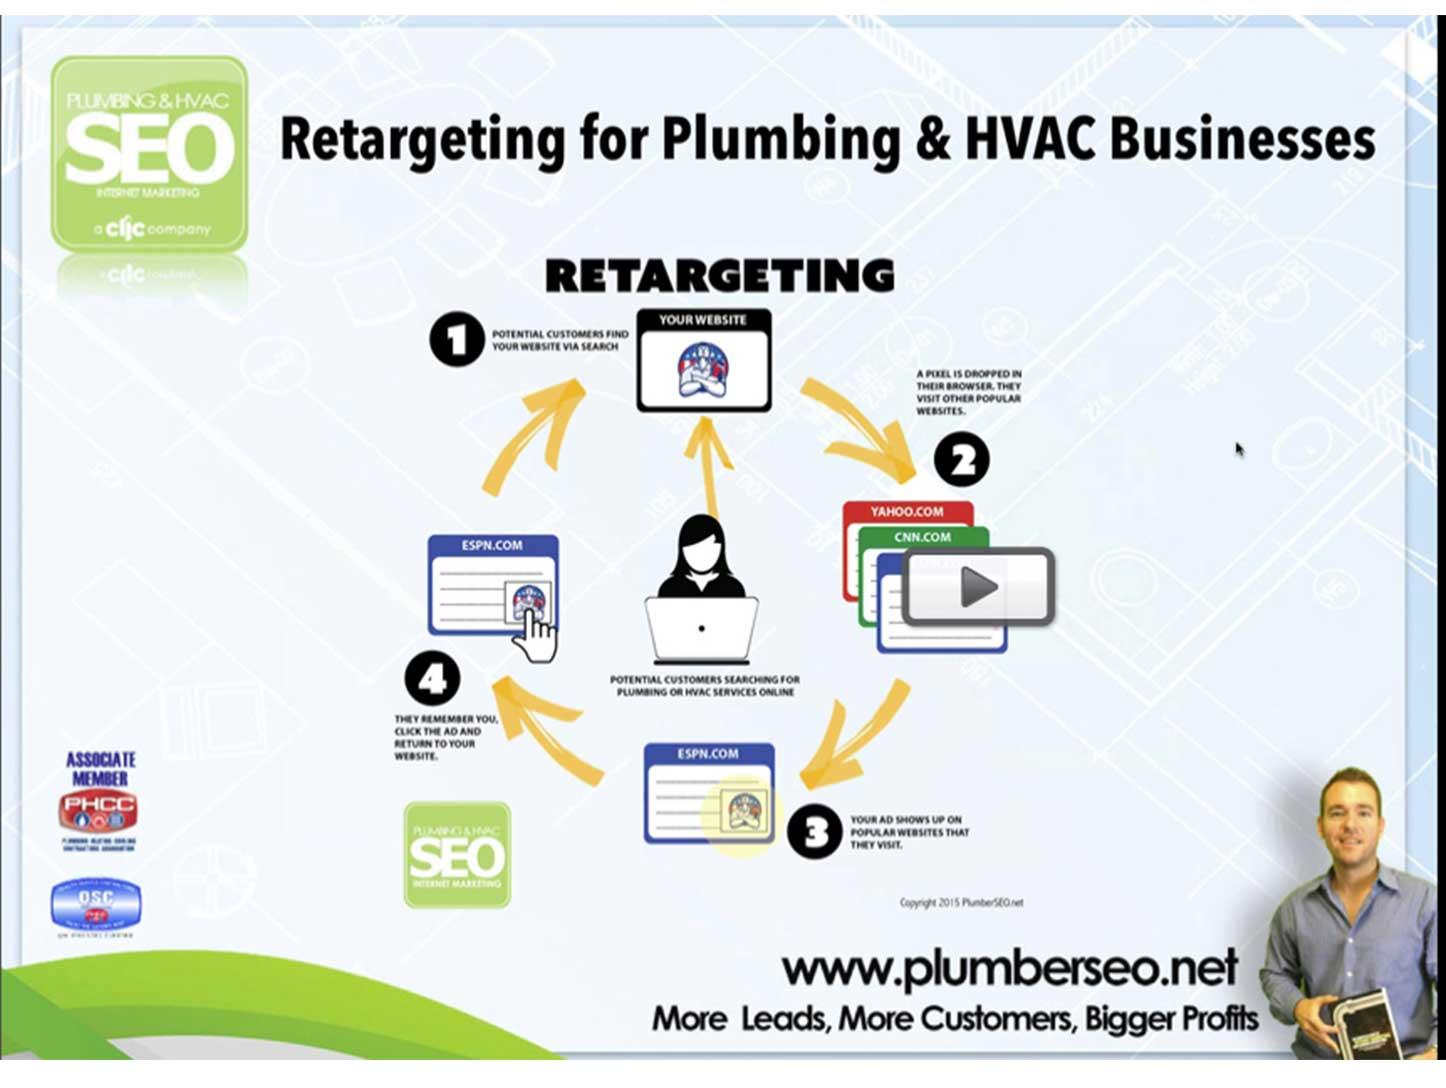 The Power of Retargeting for Plumbing & HVAC Contractors